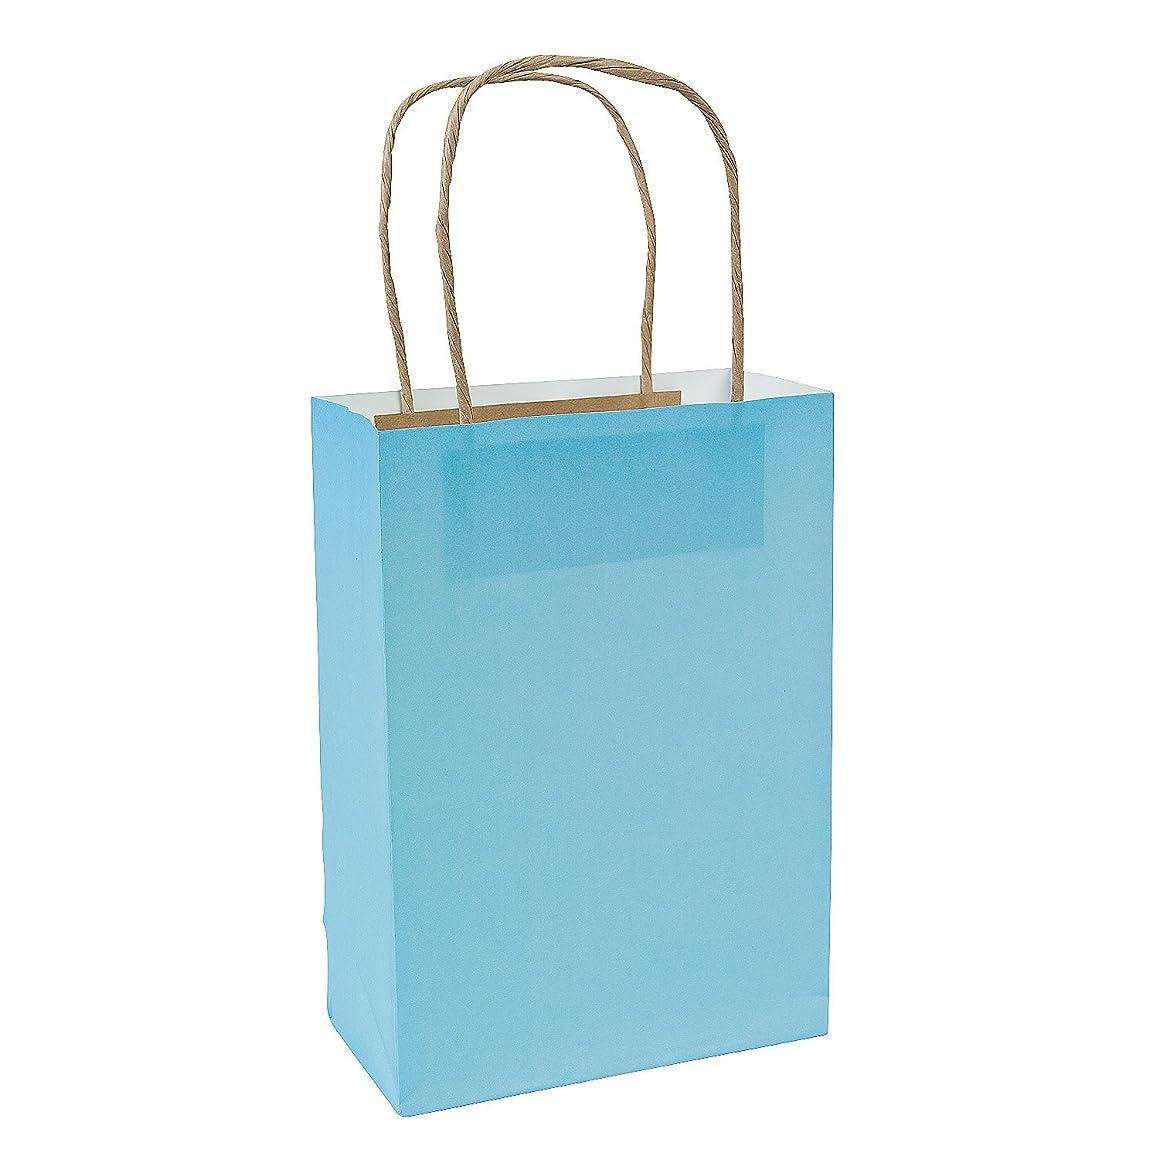 Light Blue Medium Craft Paper Bags (12 Pack)